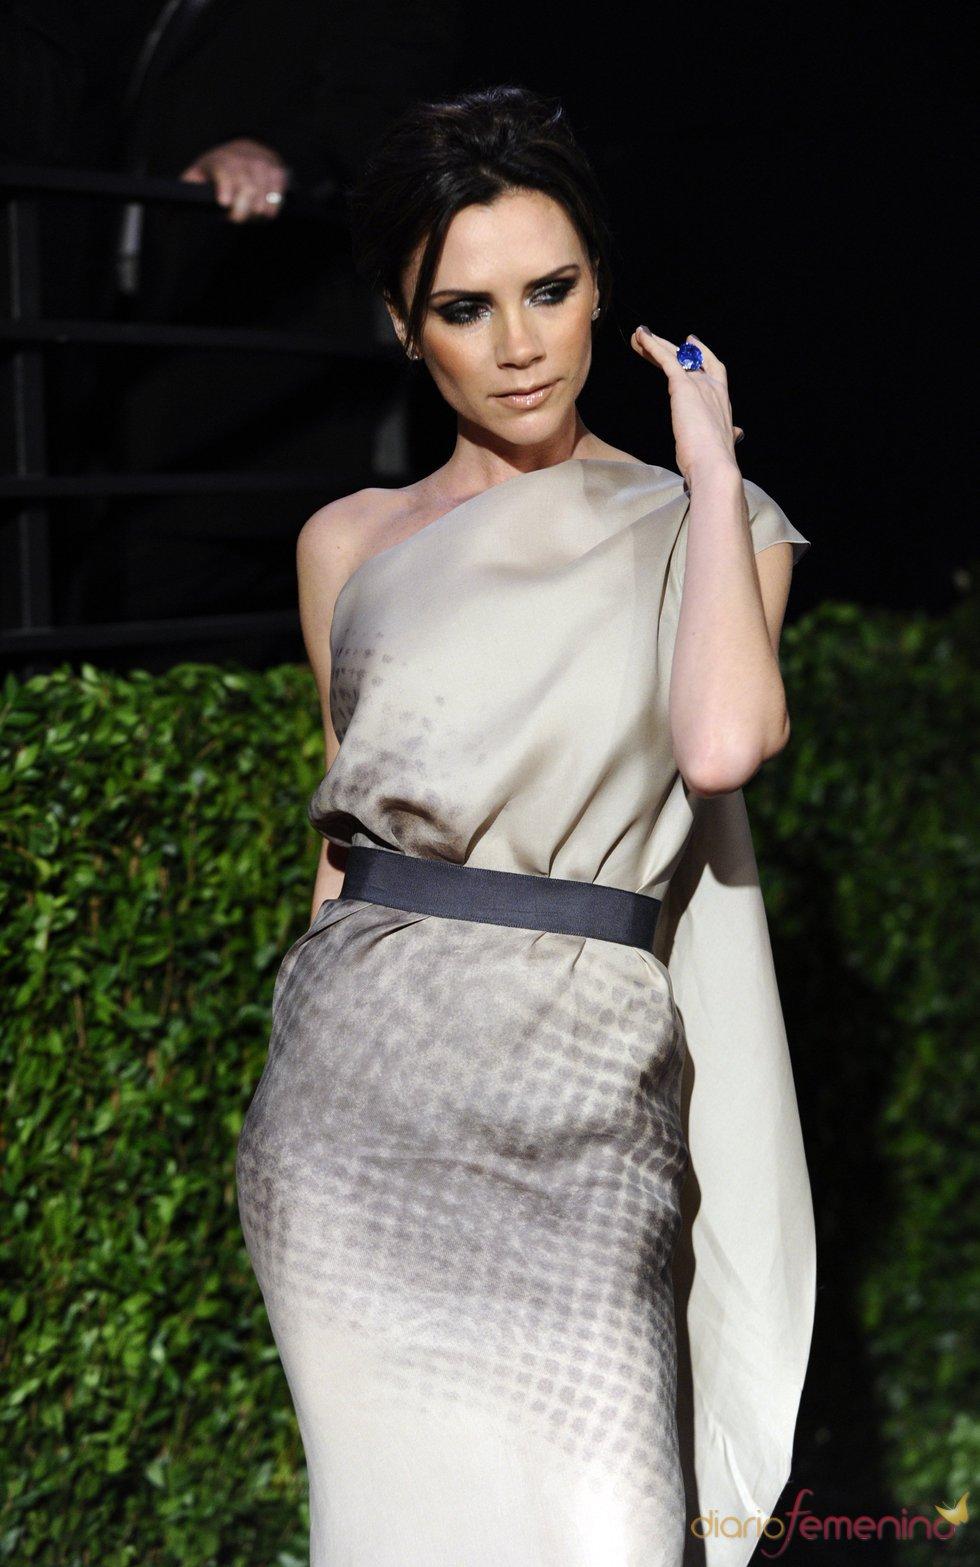 Victoria Beckham en la fiesta Vanity Fair Oscar 2010